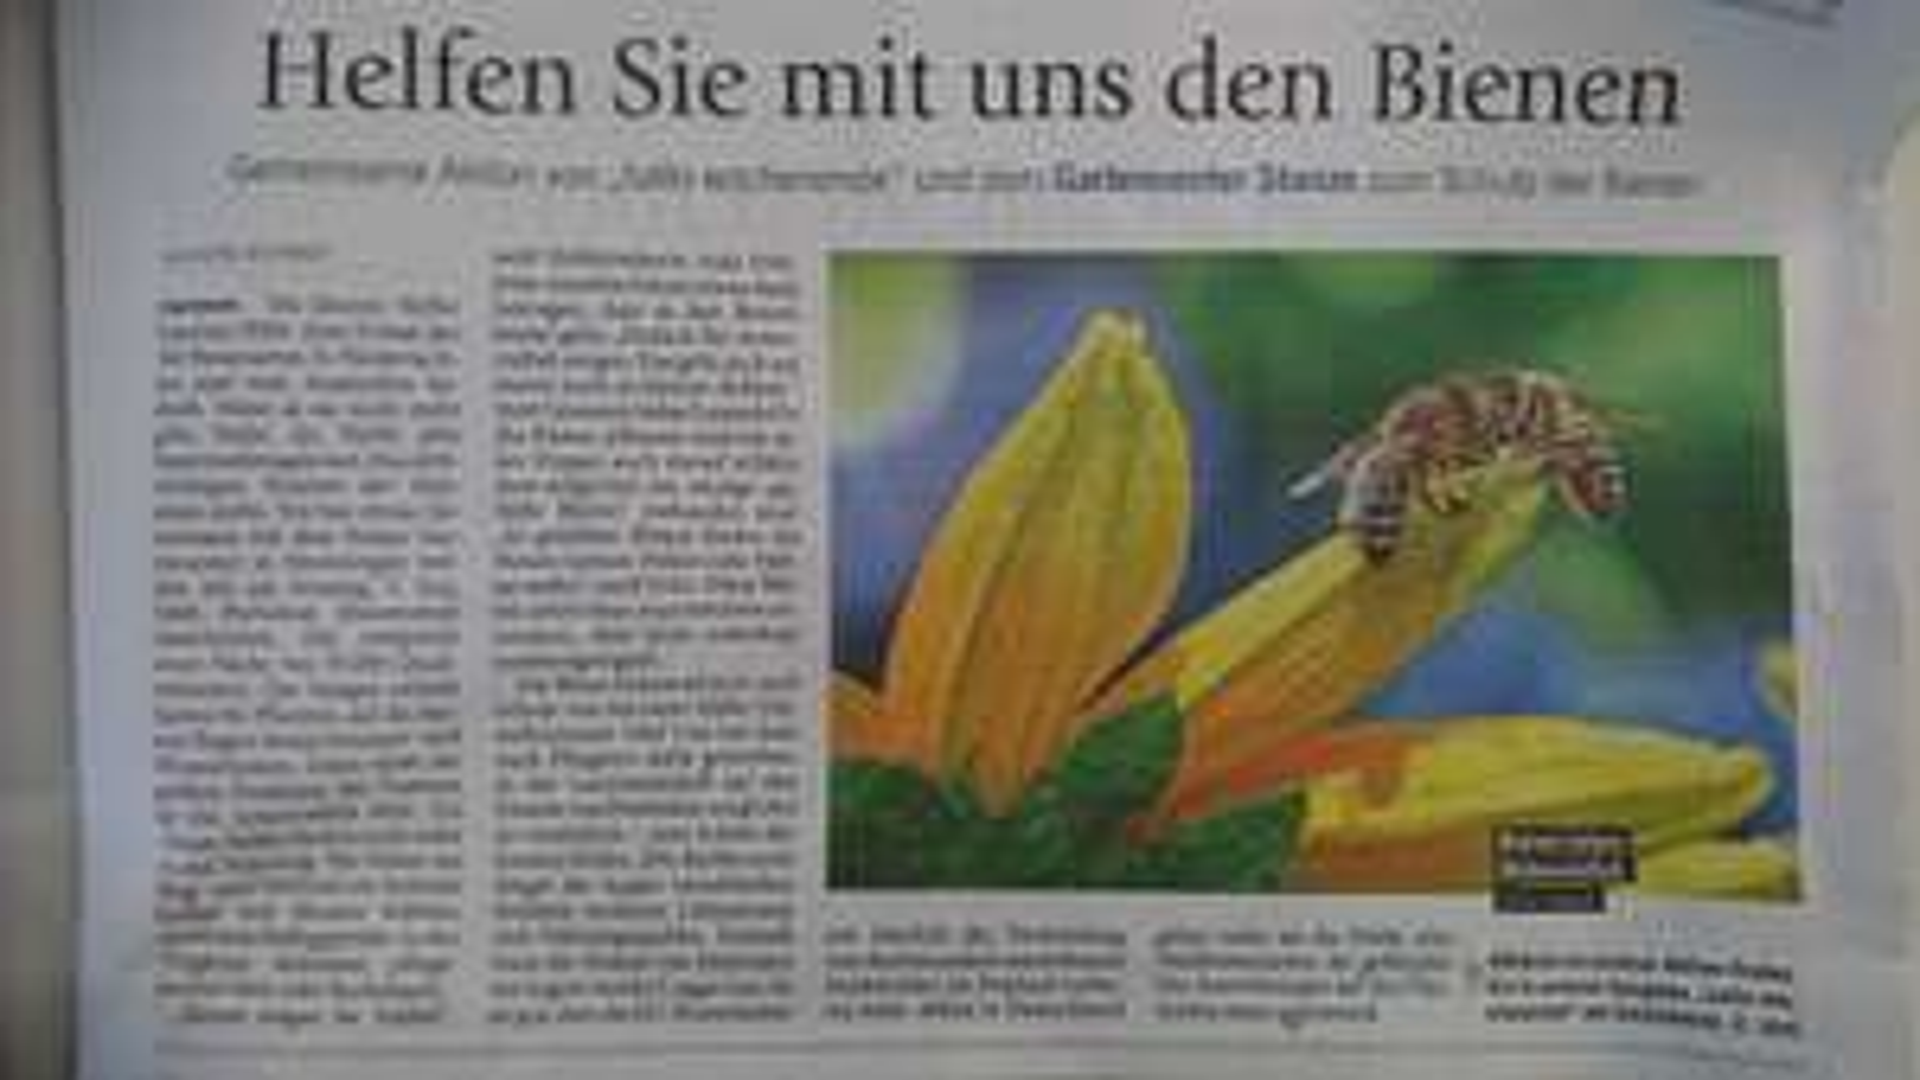 [Lokal Hannover] Stanze Gartencenter verschenkt 5000 Portionen Saatgut Bienenweide